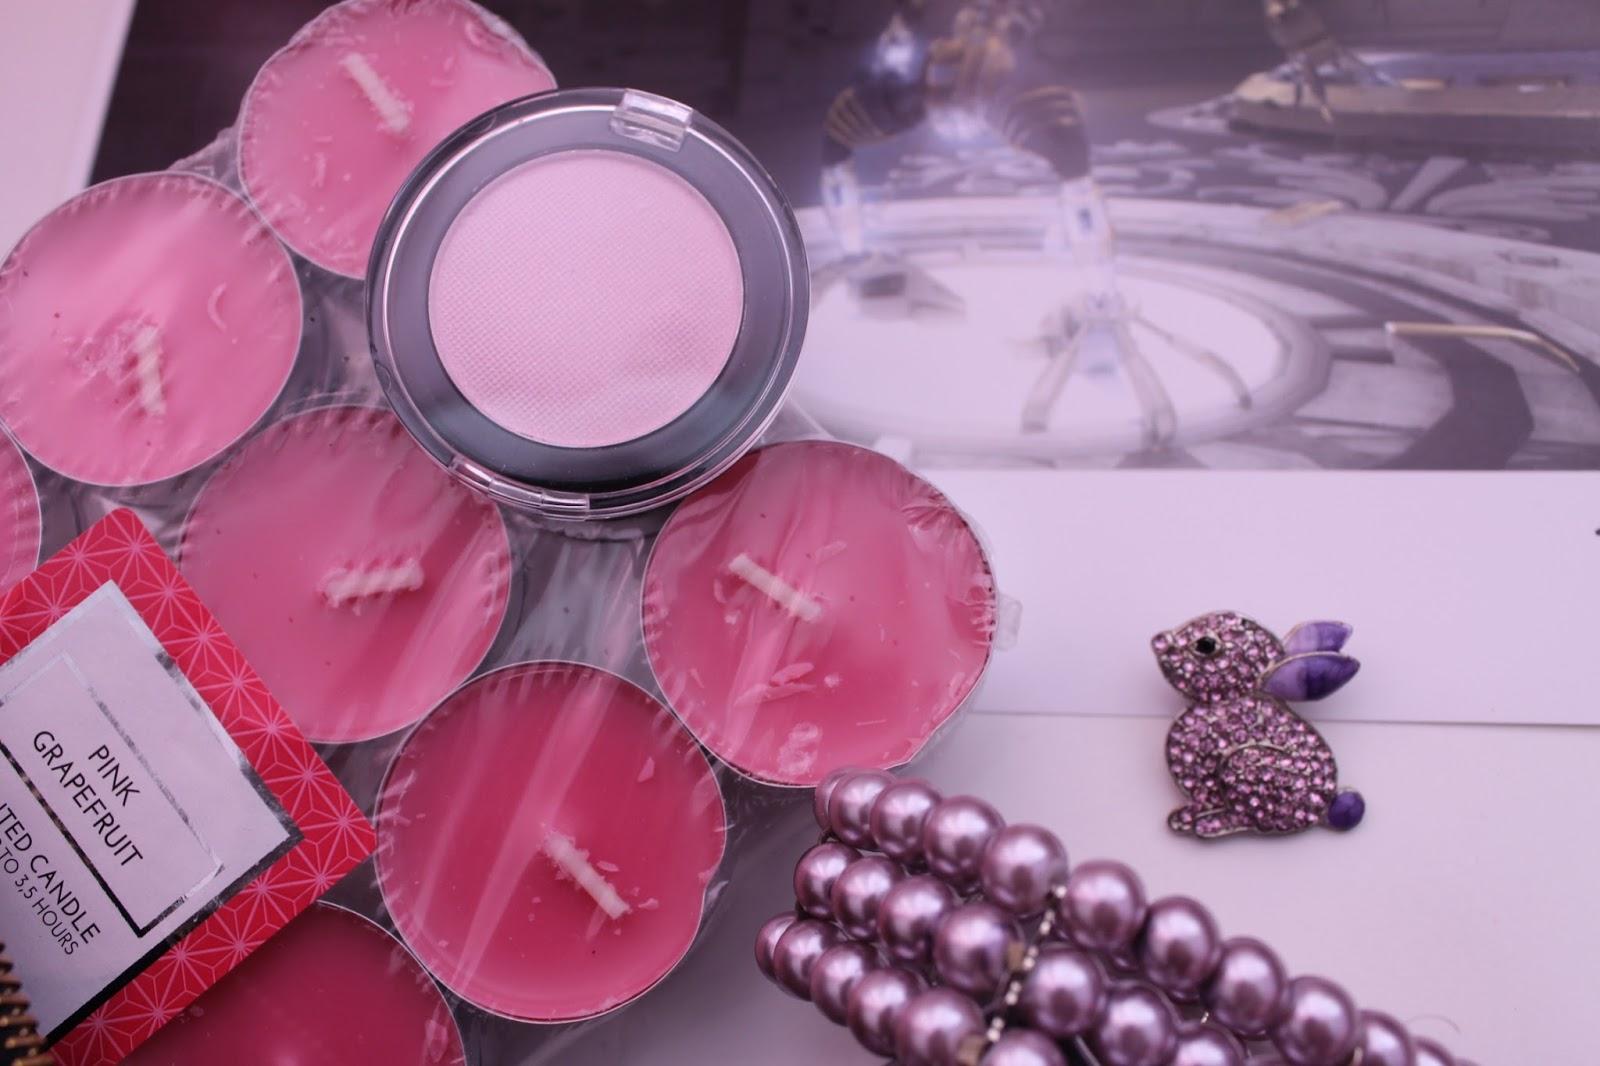 Goodies Pink Eyeshadow & Candles